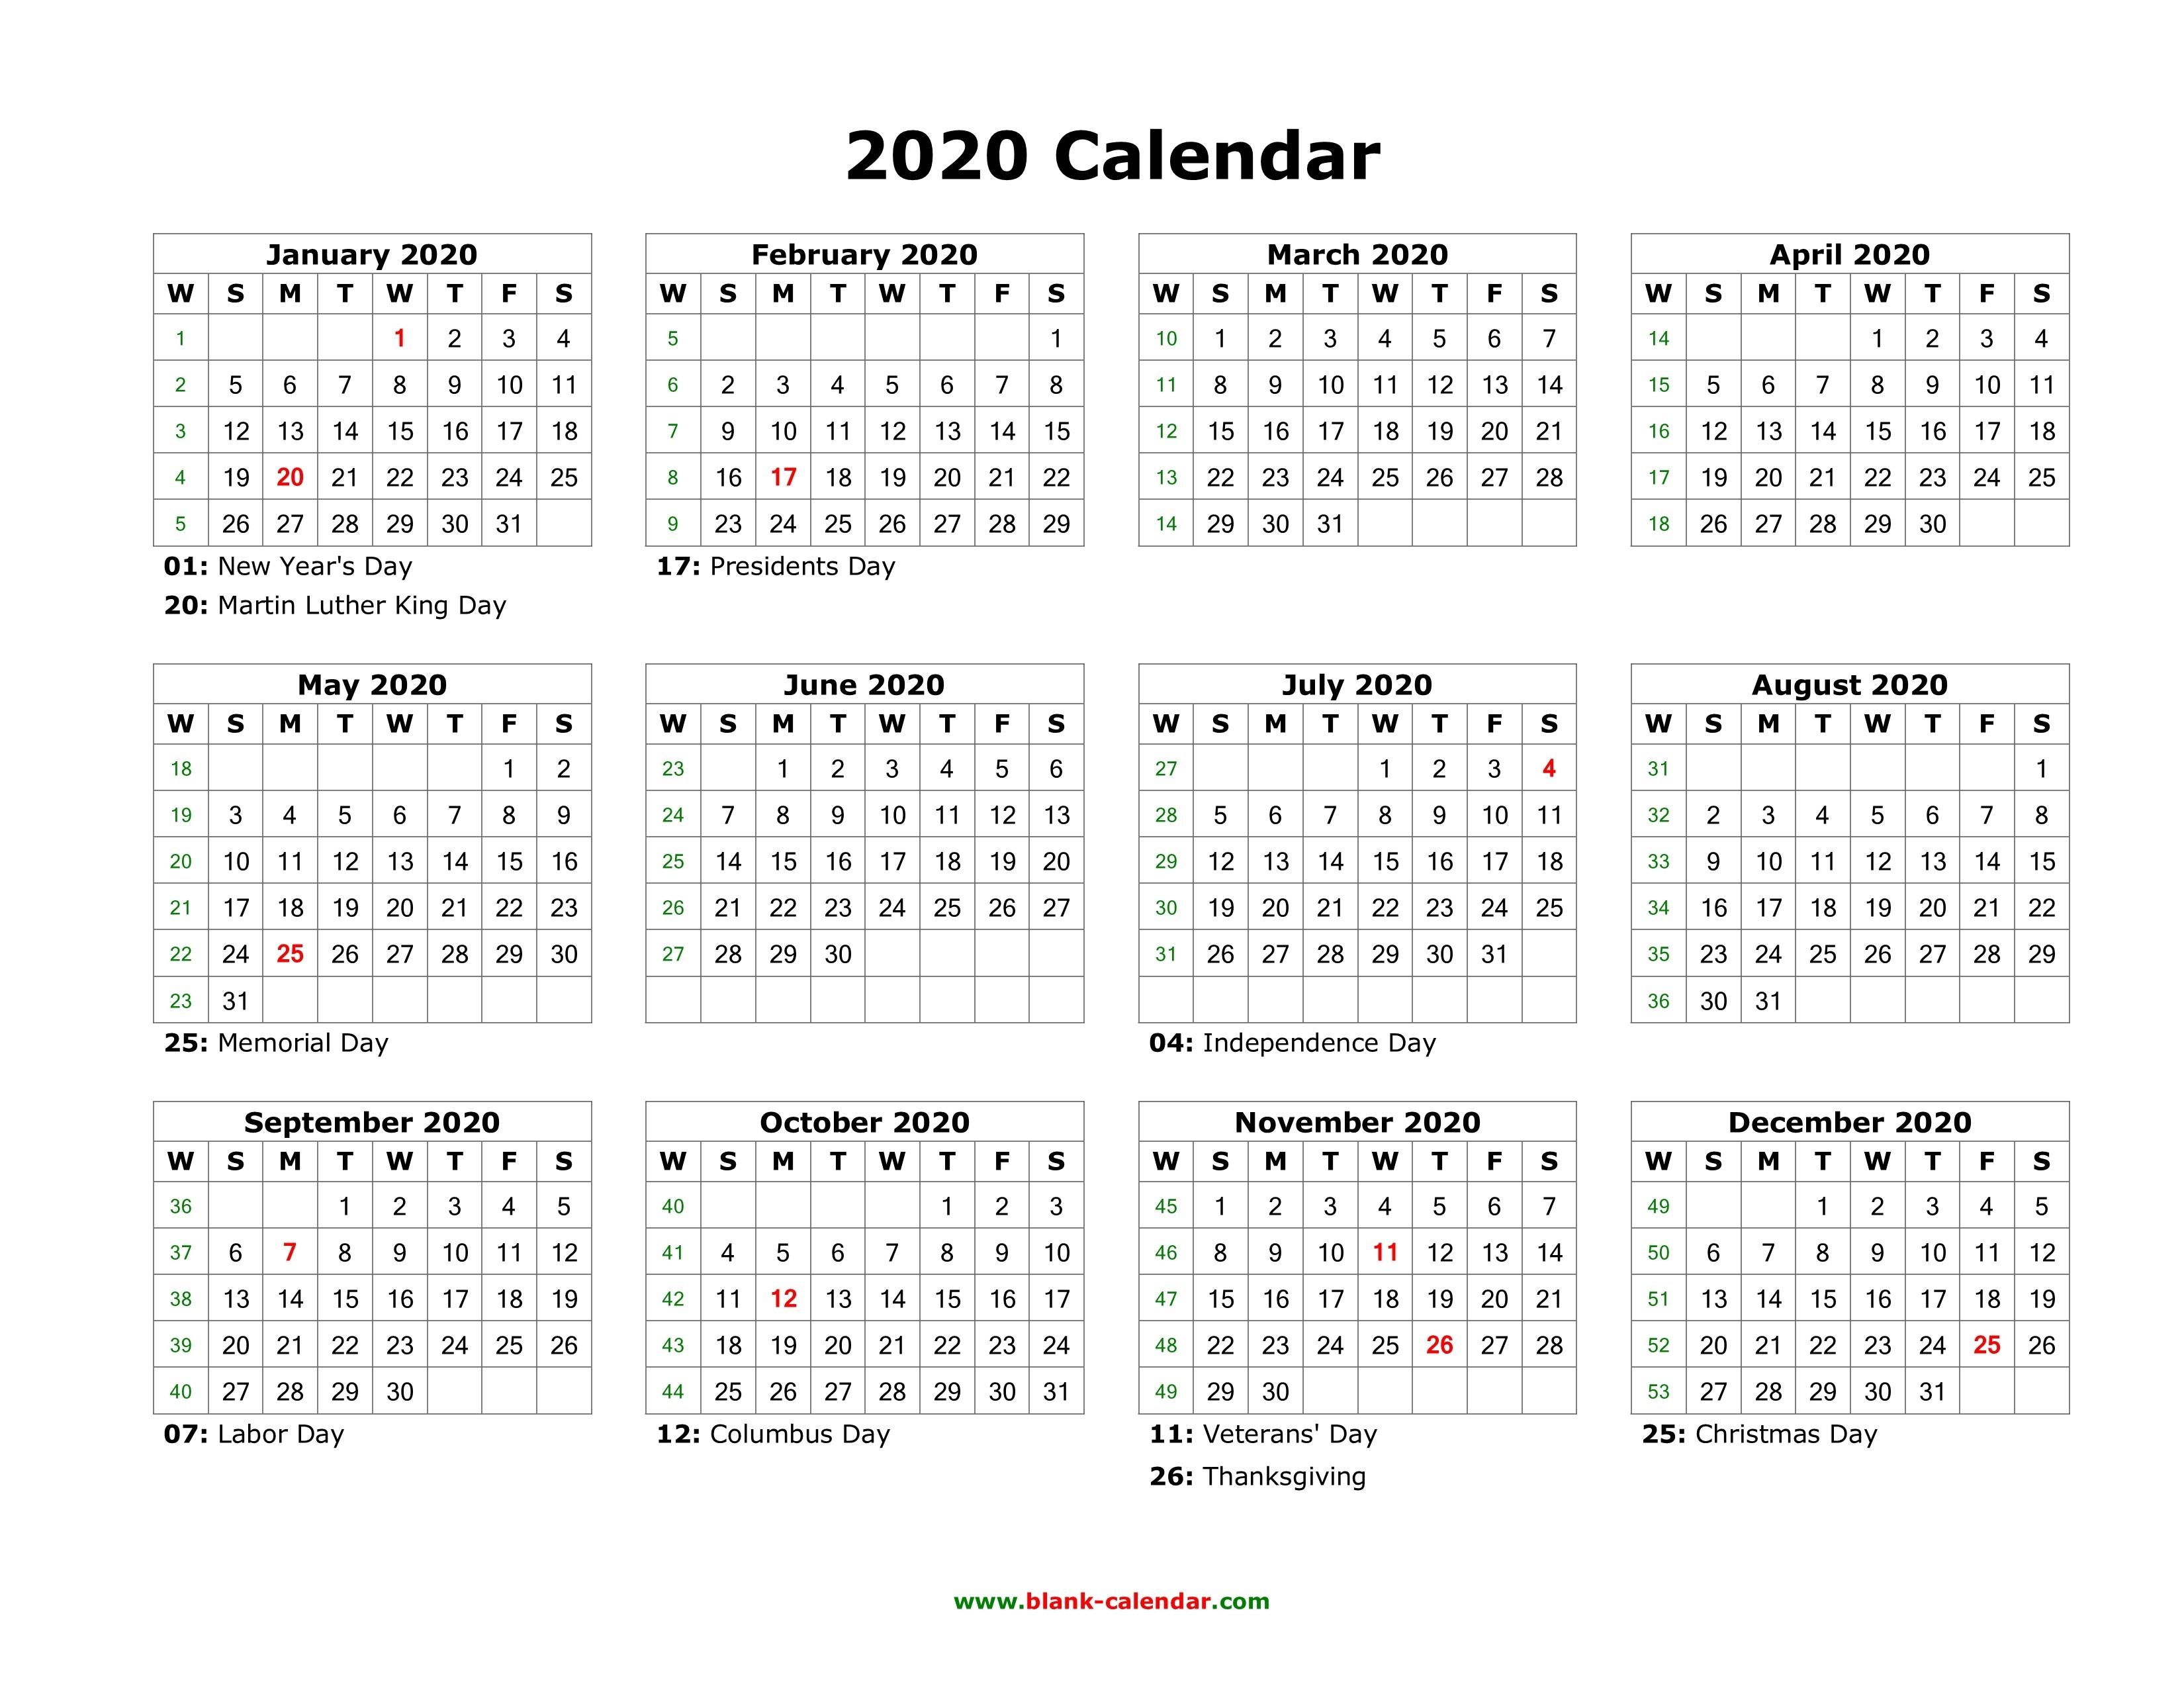 Blank Calendar 2020 | Free Download Calendar Templates-Microsoft Calendar Templates 2020